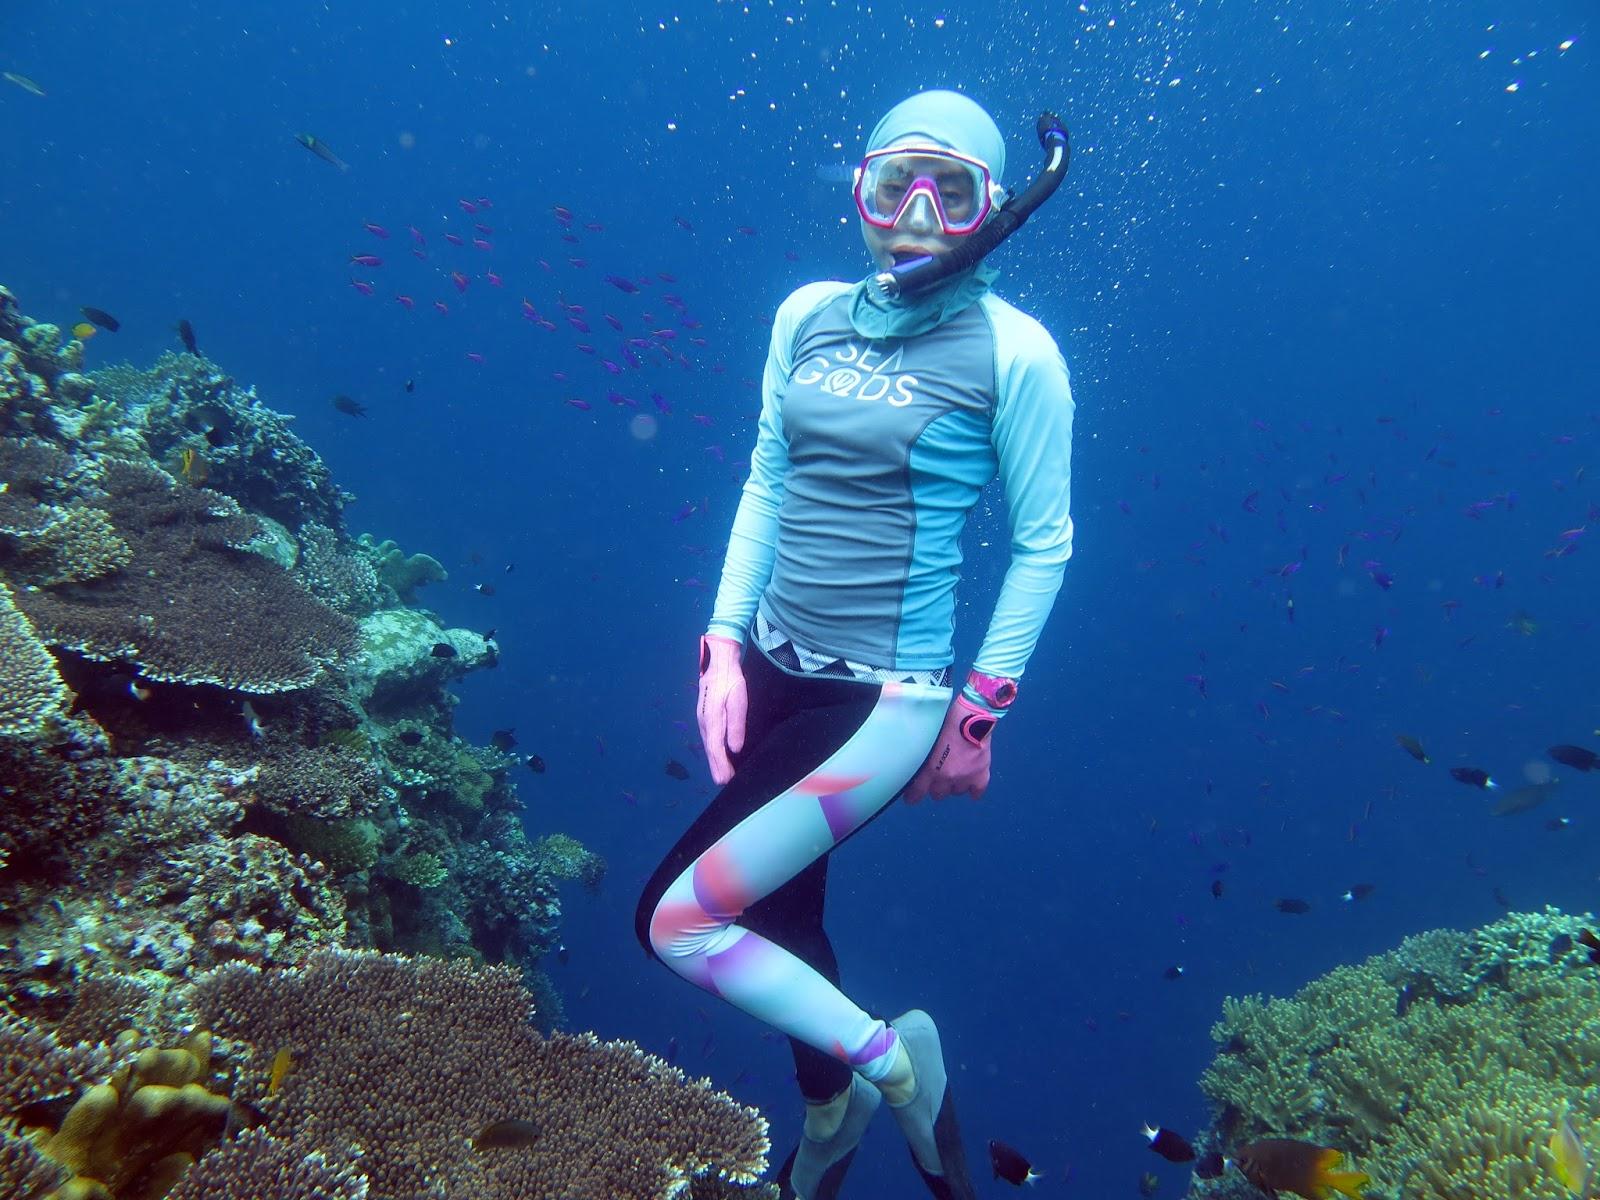 April 2018 Gorontalo Luar Biasa Taman Laut Olele Terletak Desa